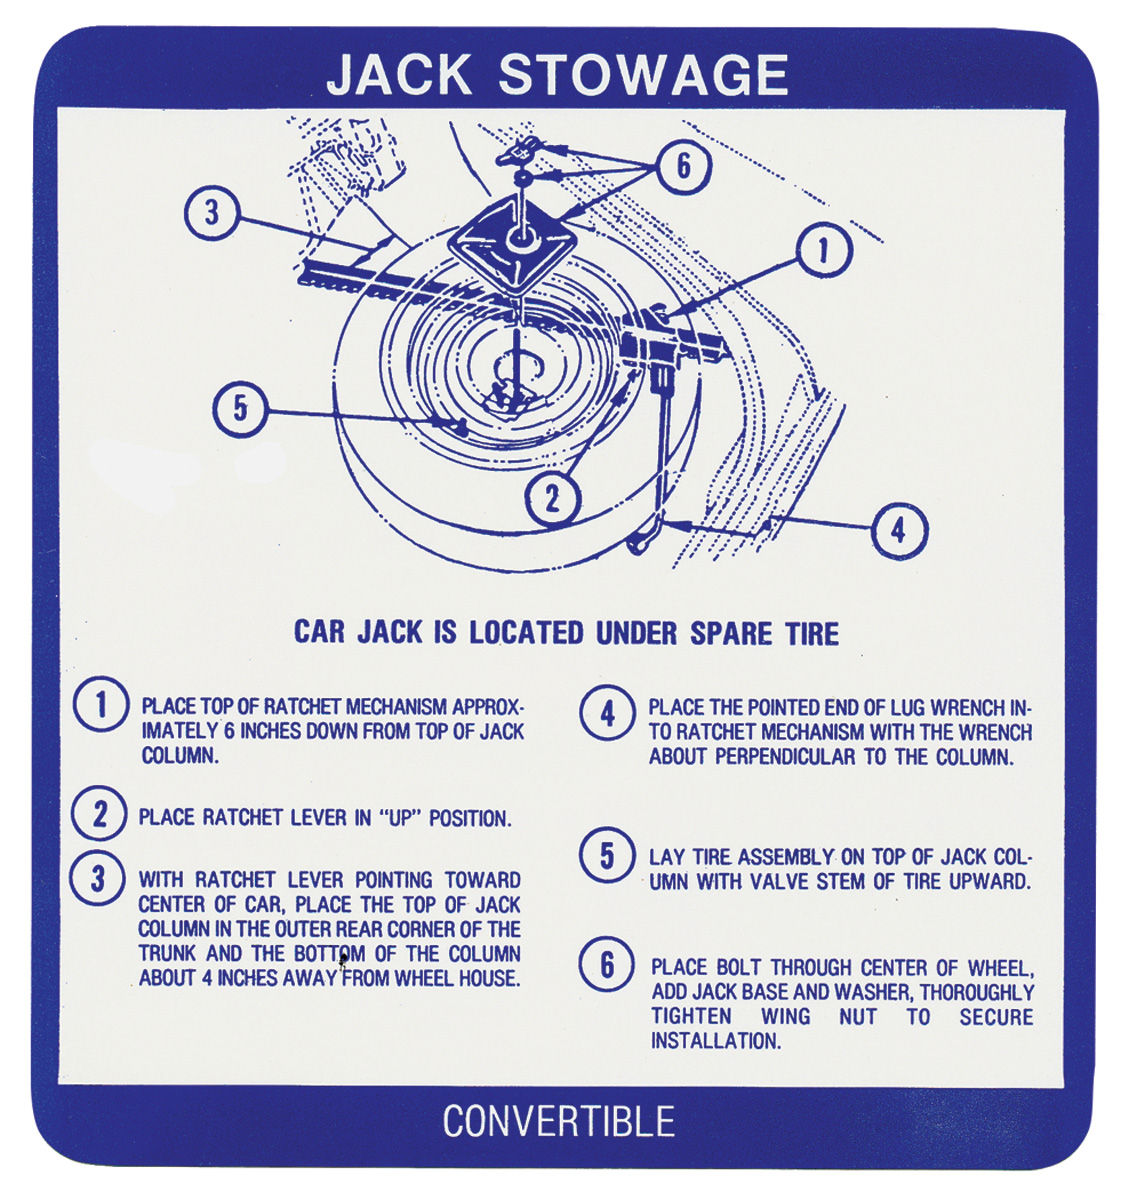 Decal, 67 Bonneville Catalina, Jack Storage, Convertible